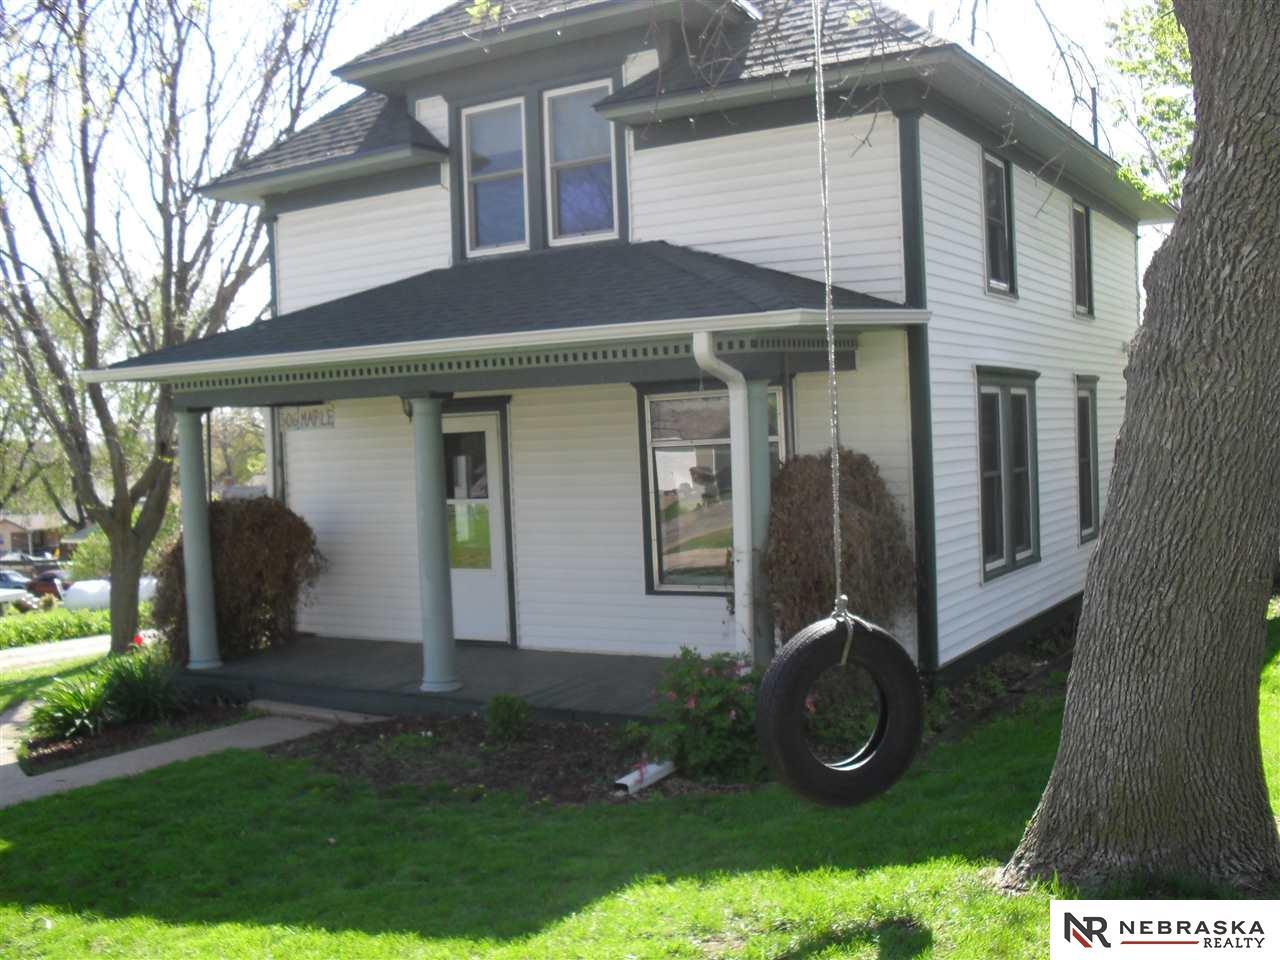 306 Maple St, Kennard, NE 68034